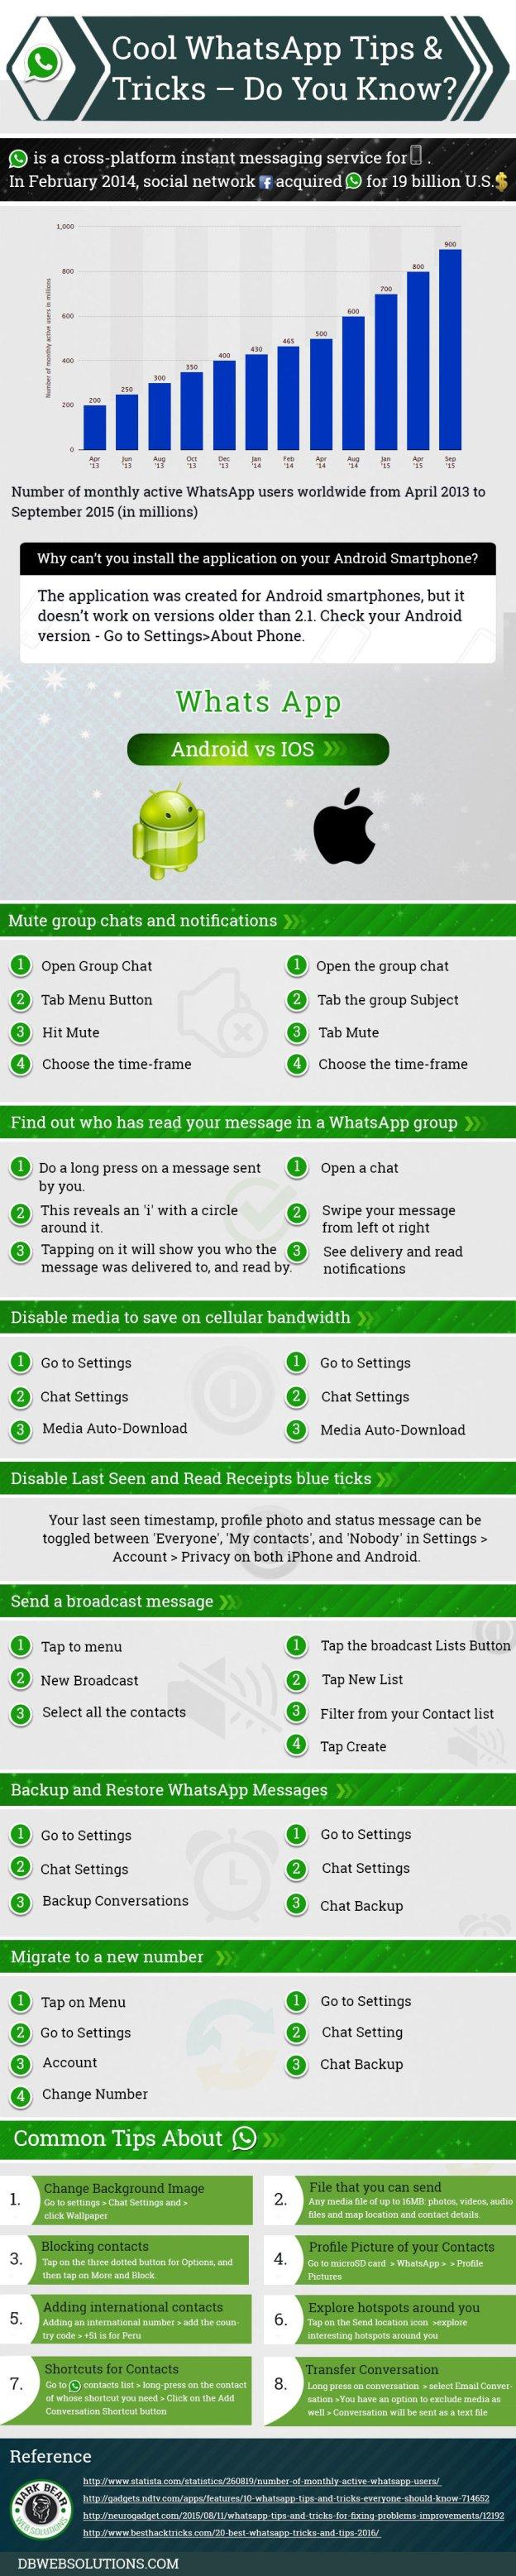 whatsapp-15-funciones-escondidas-infografia